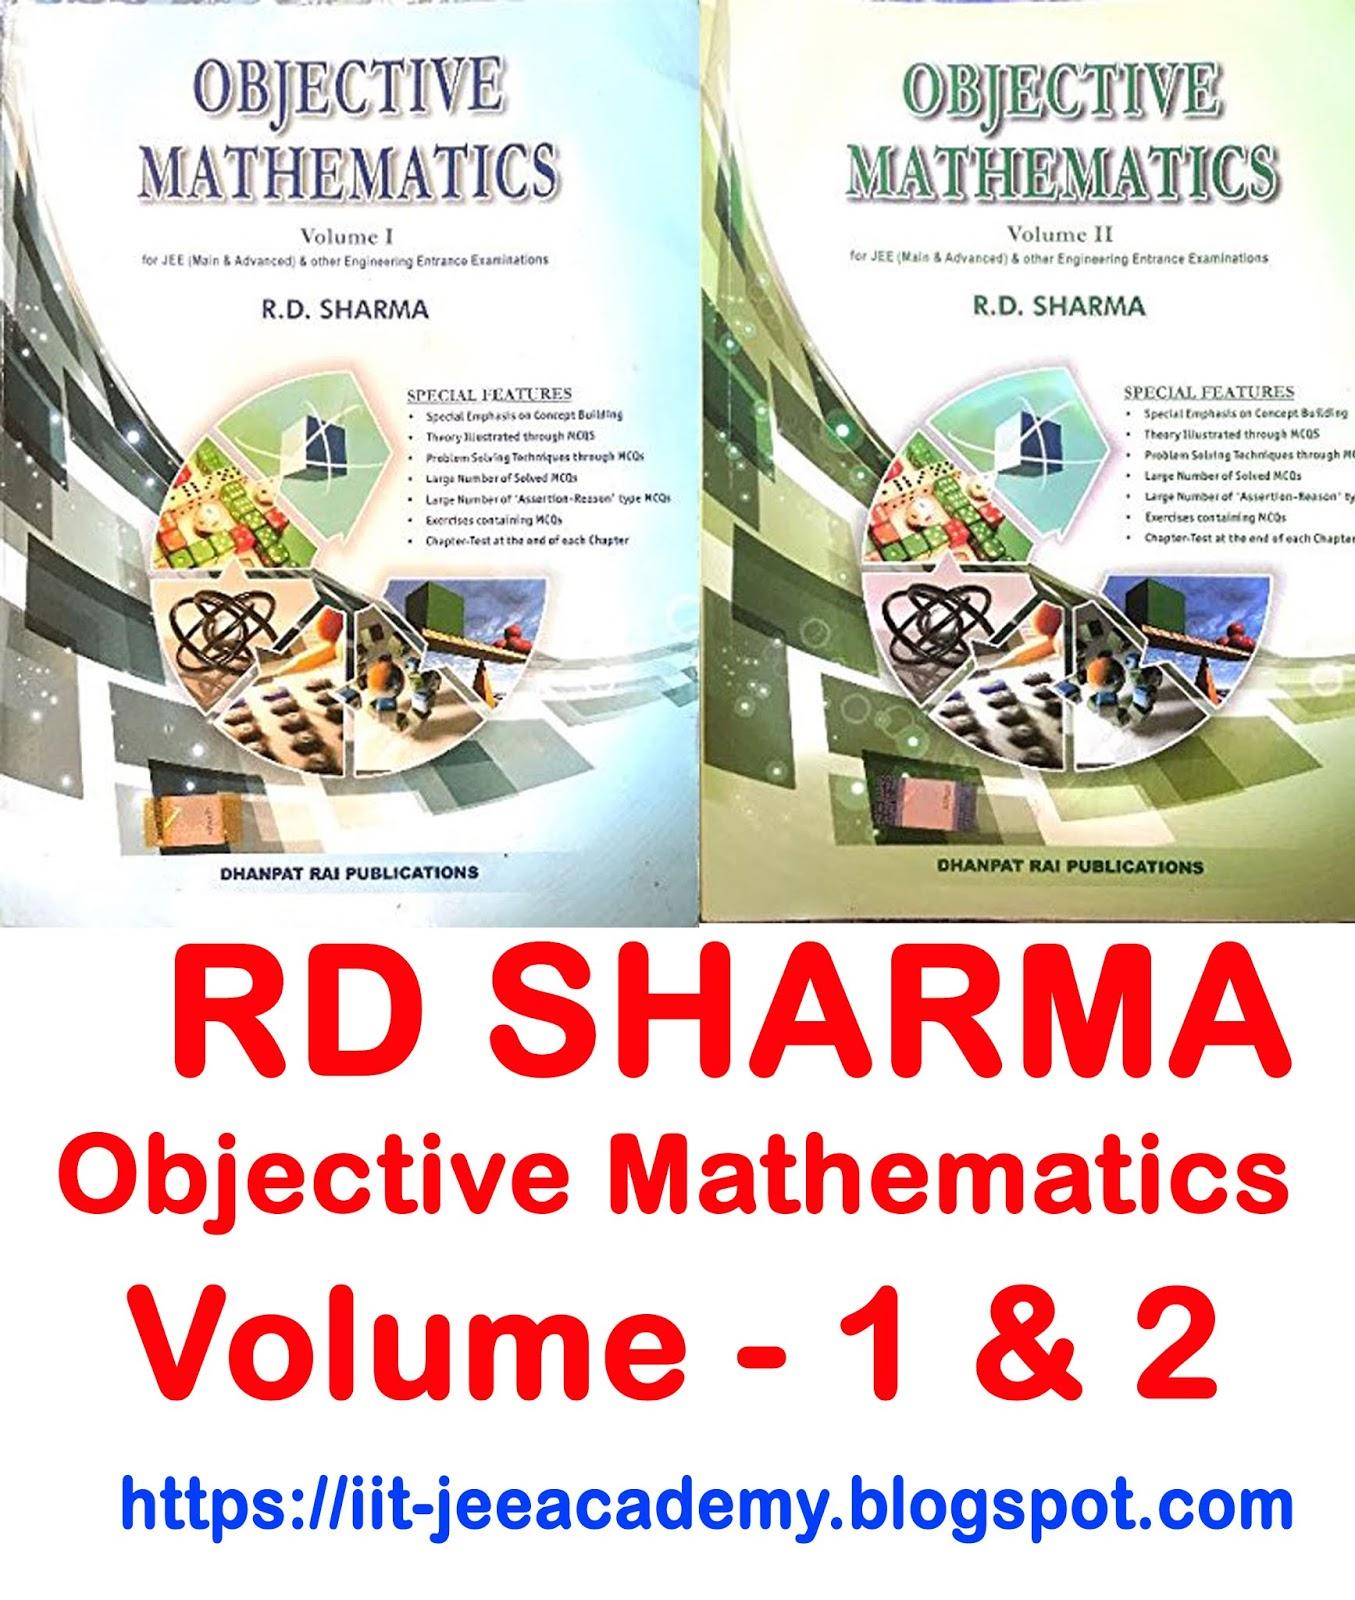 RD Sharma Objective Mathematics Vol-1 & 2 For JEE ADV & MAIN PDF